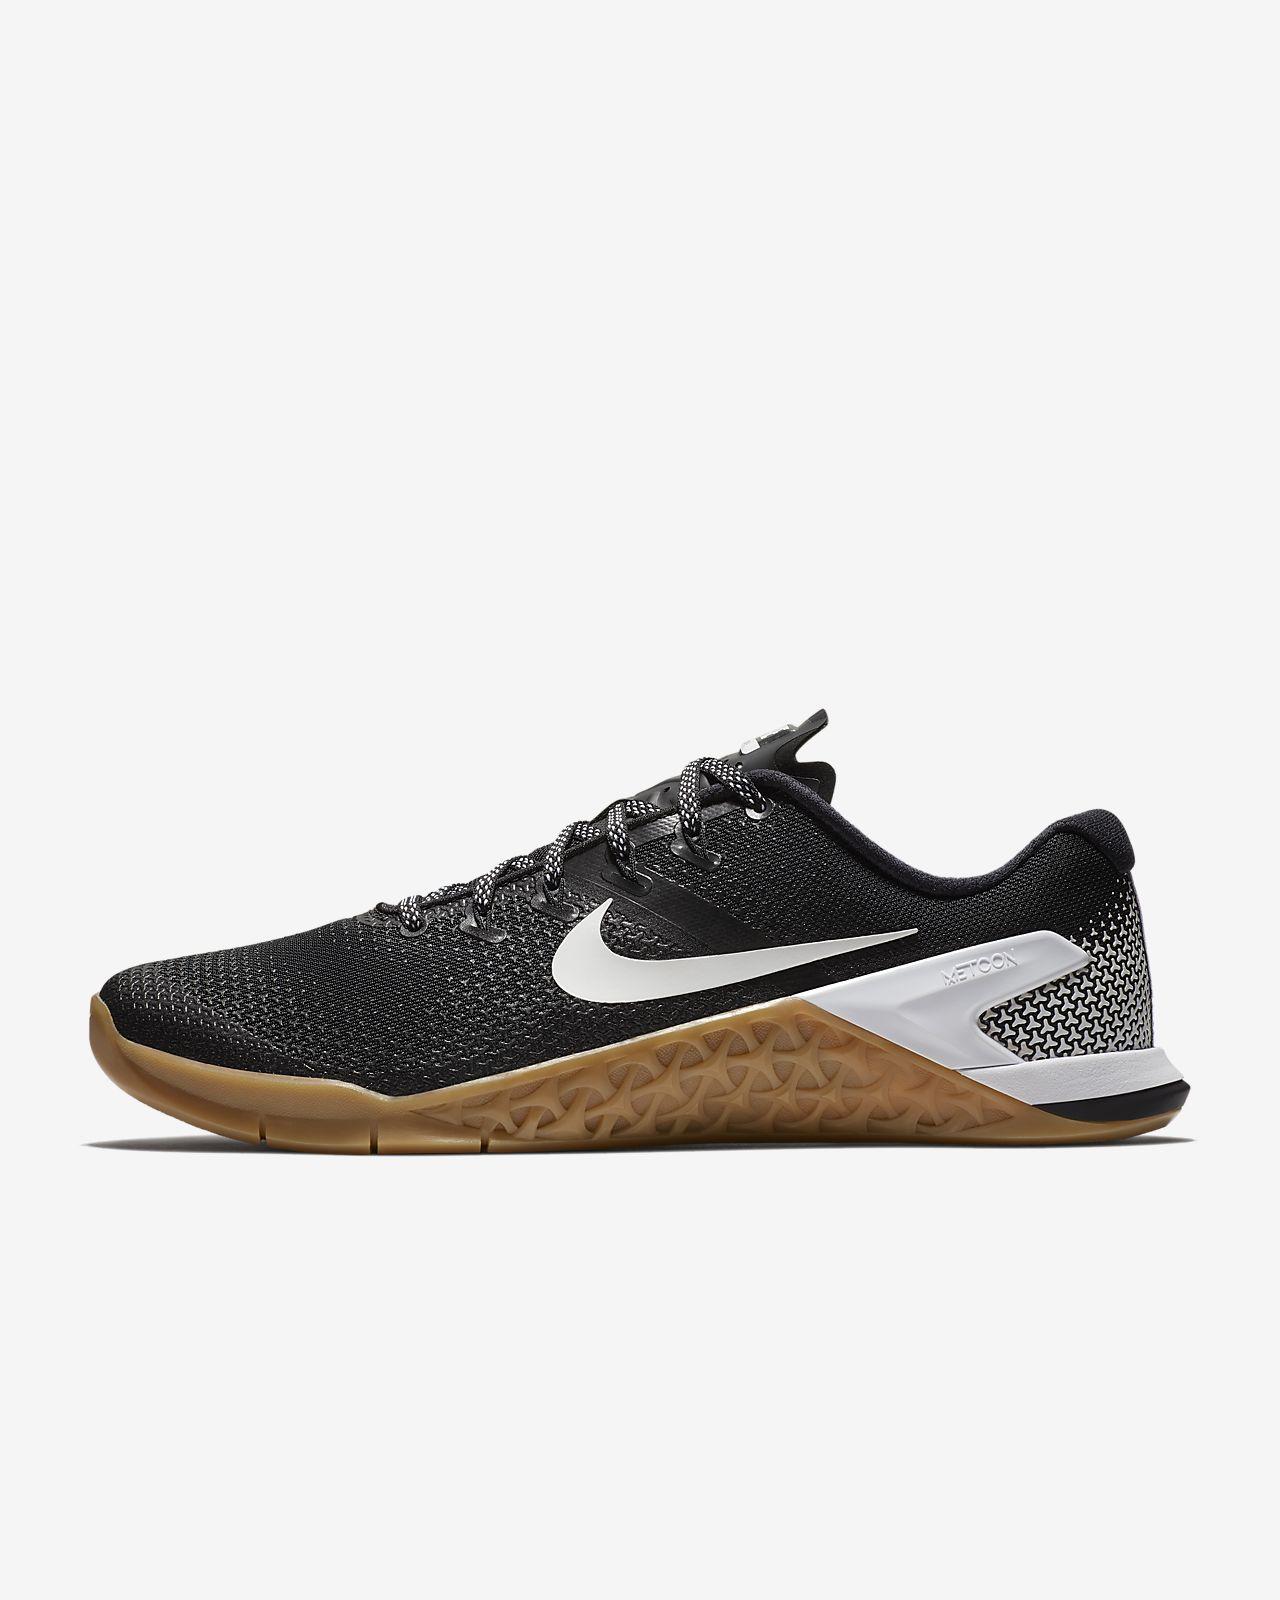 Nike Metcon 4 Men's Cross TrainingWeightlifting Shoe